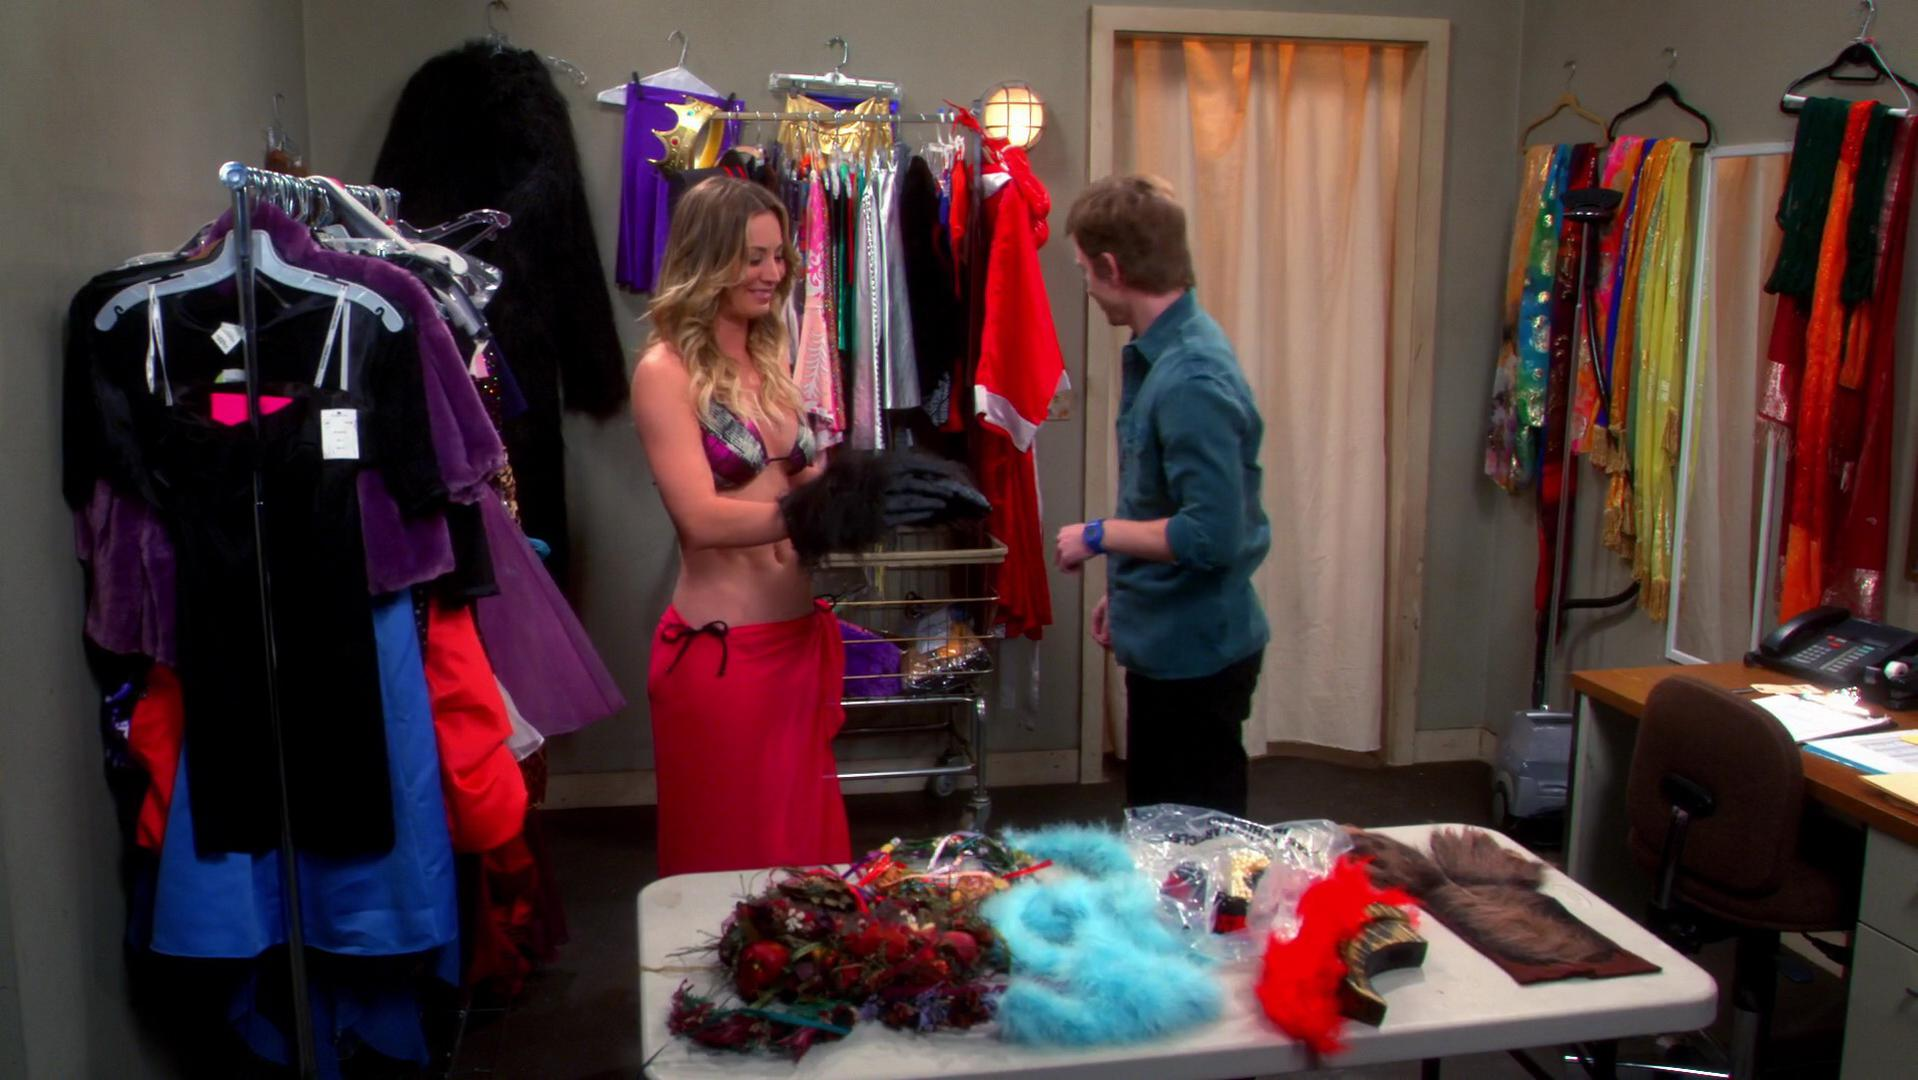 Kaley Cuoco sexy - The Big Bang Theory s07e19 (2014)